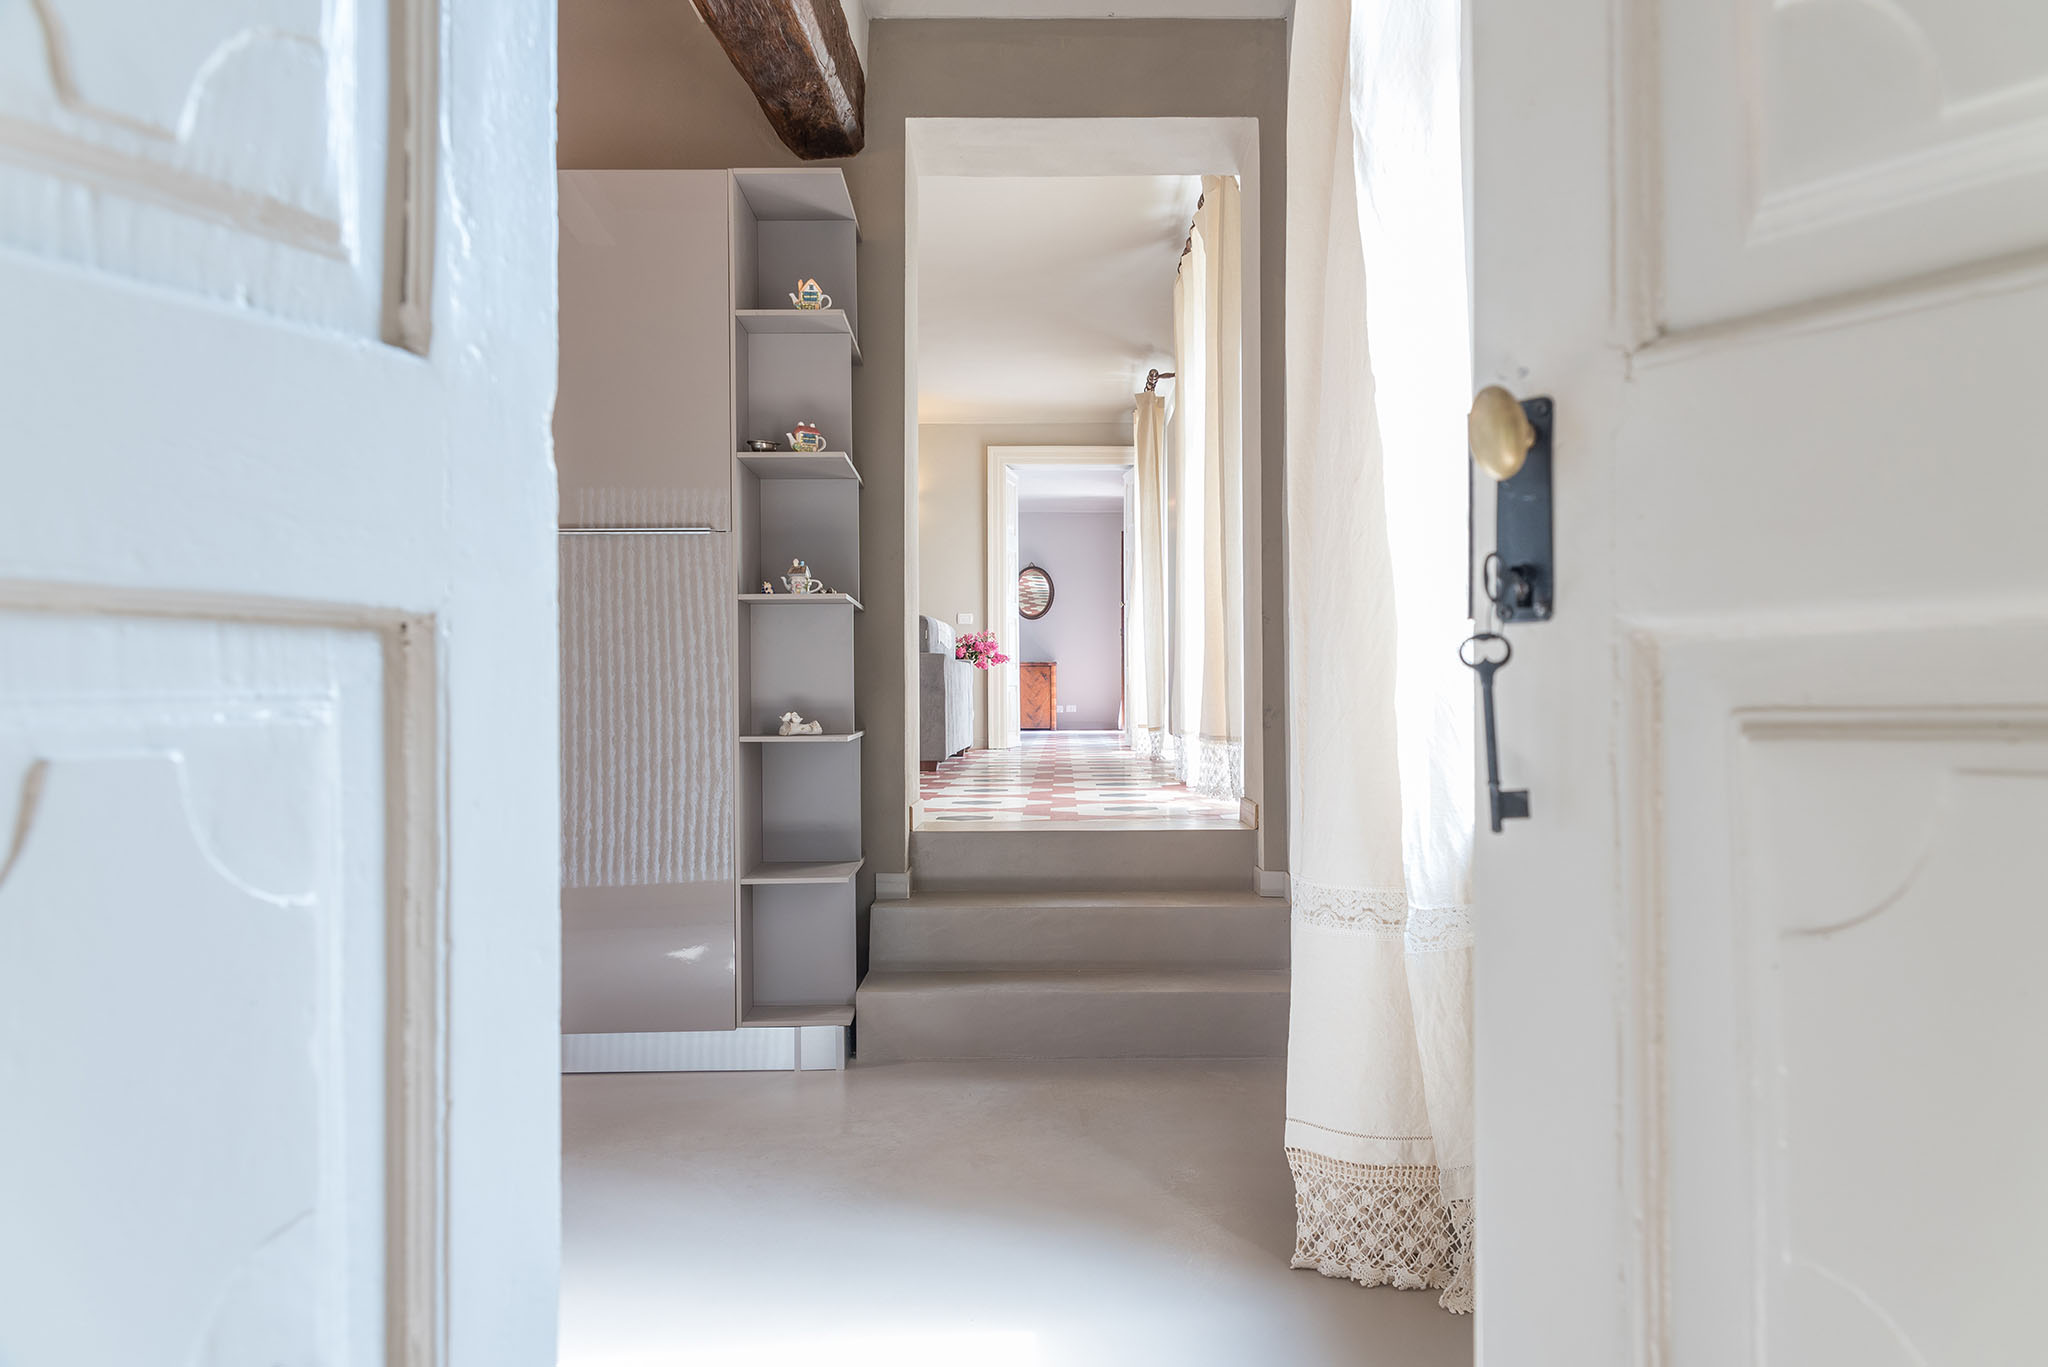 Architettura - Interni - Interior Photography Fotografo di interni Emanuele Tibaldi 3 1 - Fotografo-di-Interni-per-Airbnb-Booking - Fotografo-di-Interni-per-Airbnb-Booking